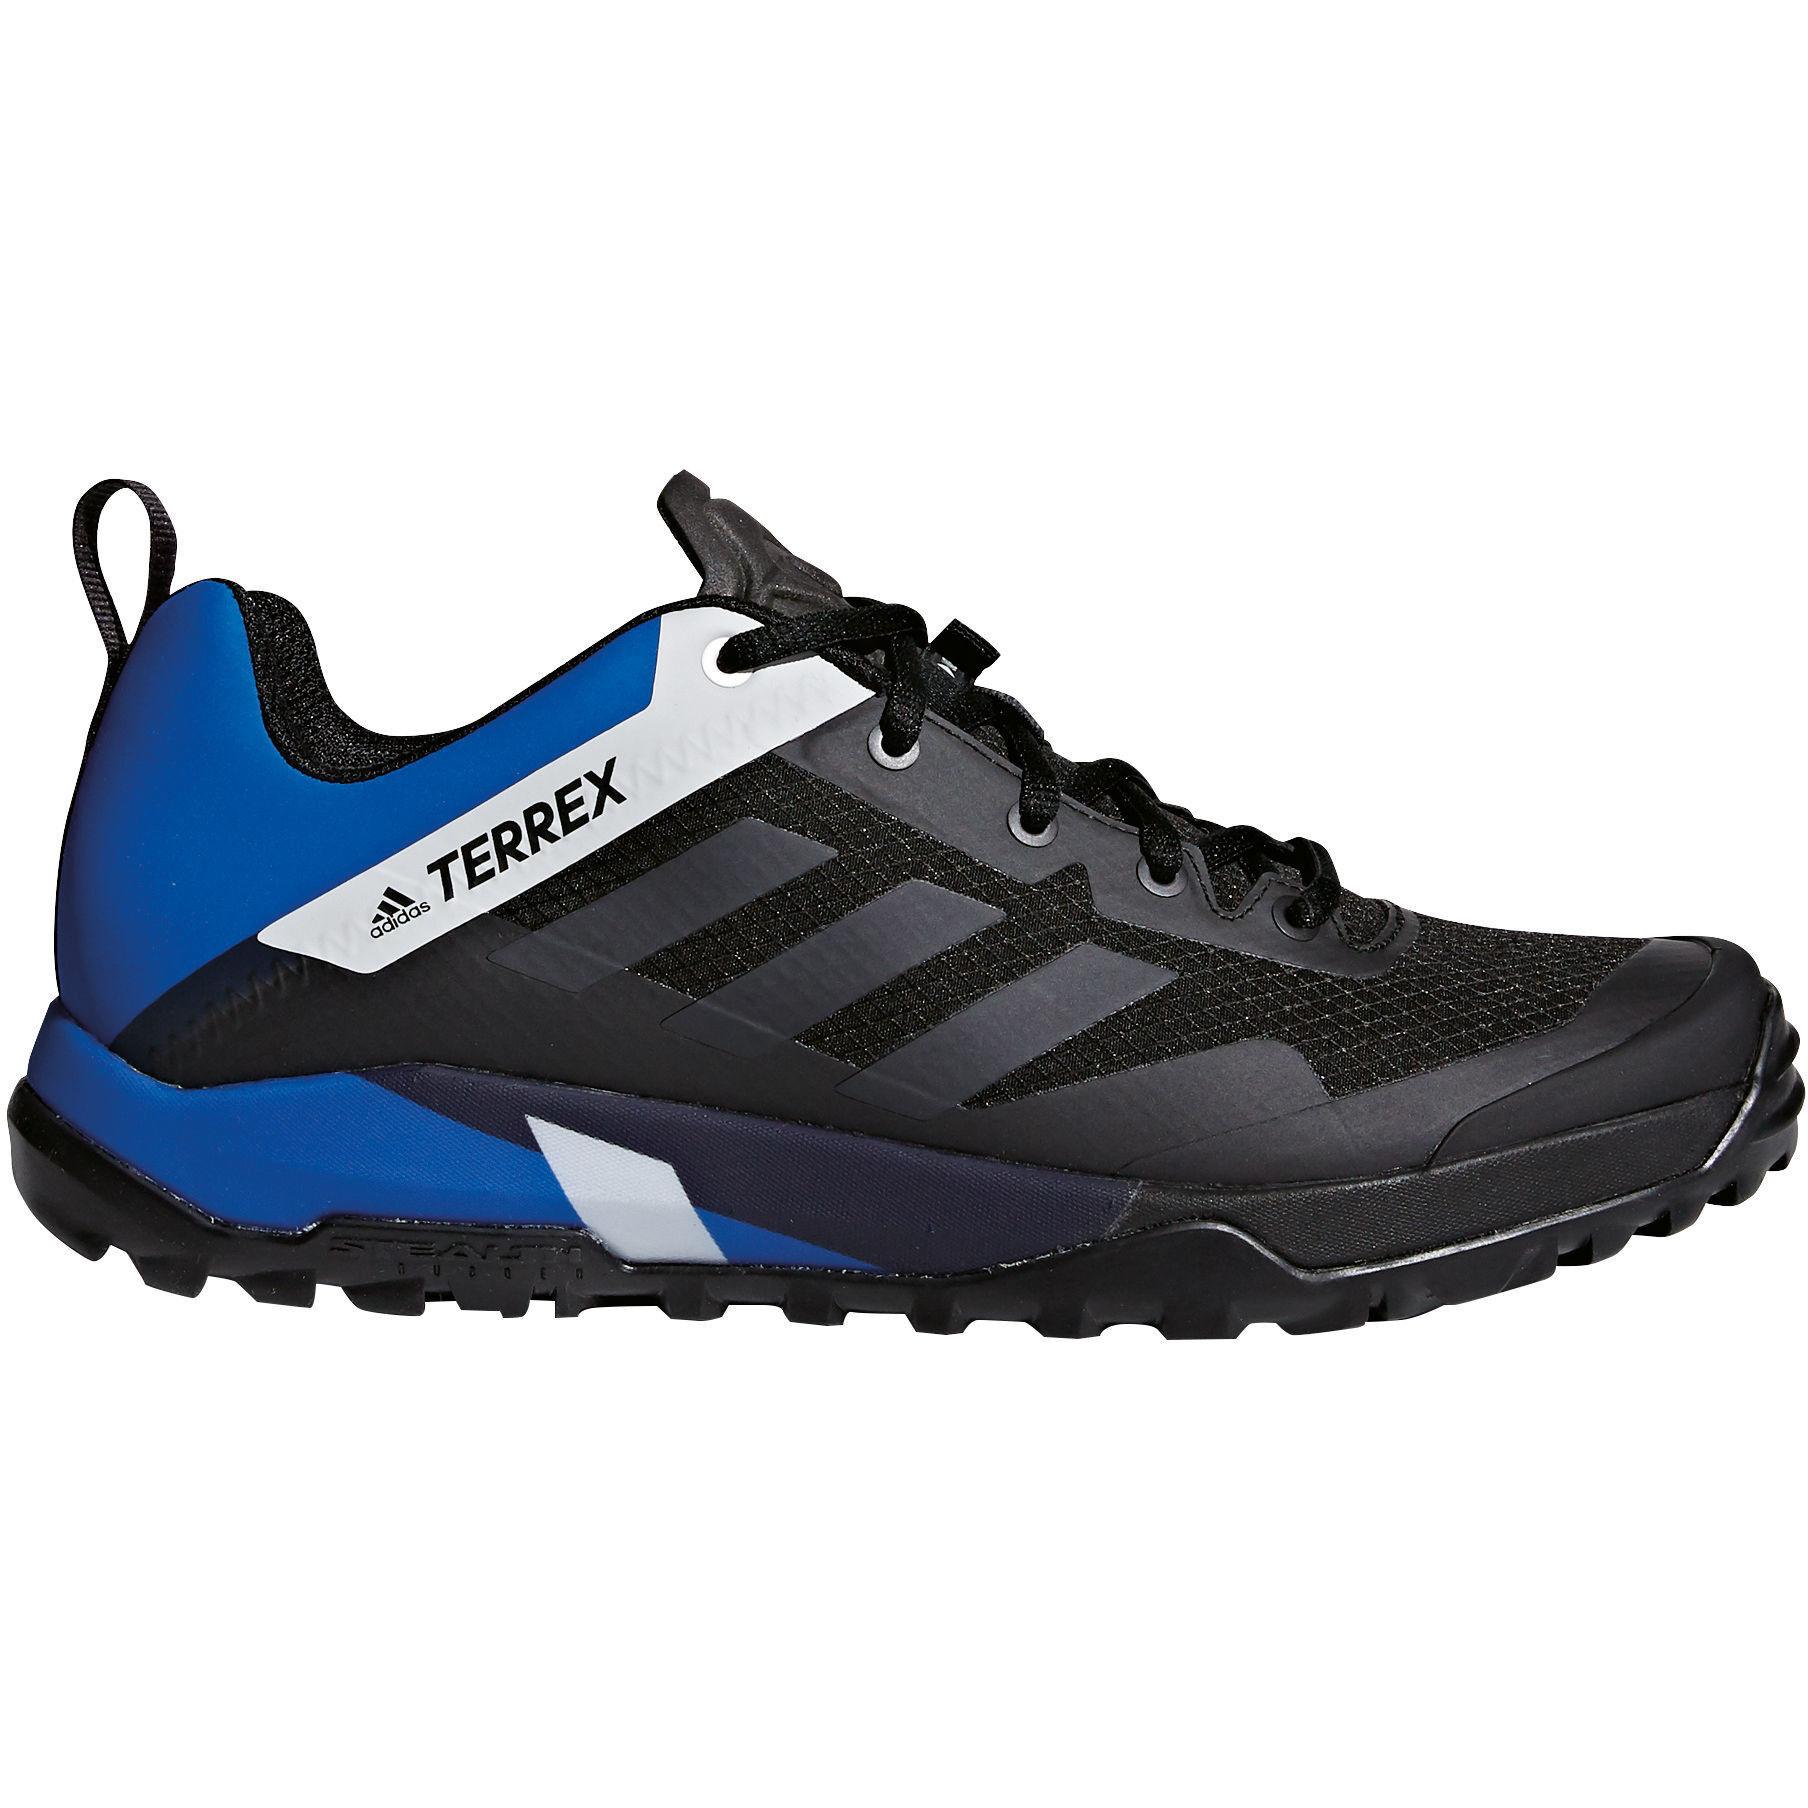 Schuhe Terrex Adidas Mtb Günstig Kaufen CdthQsrxBo